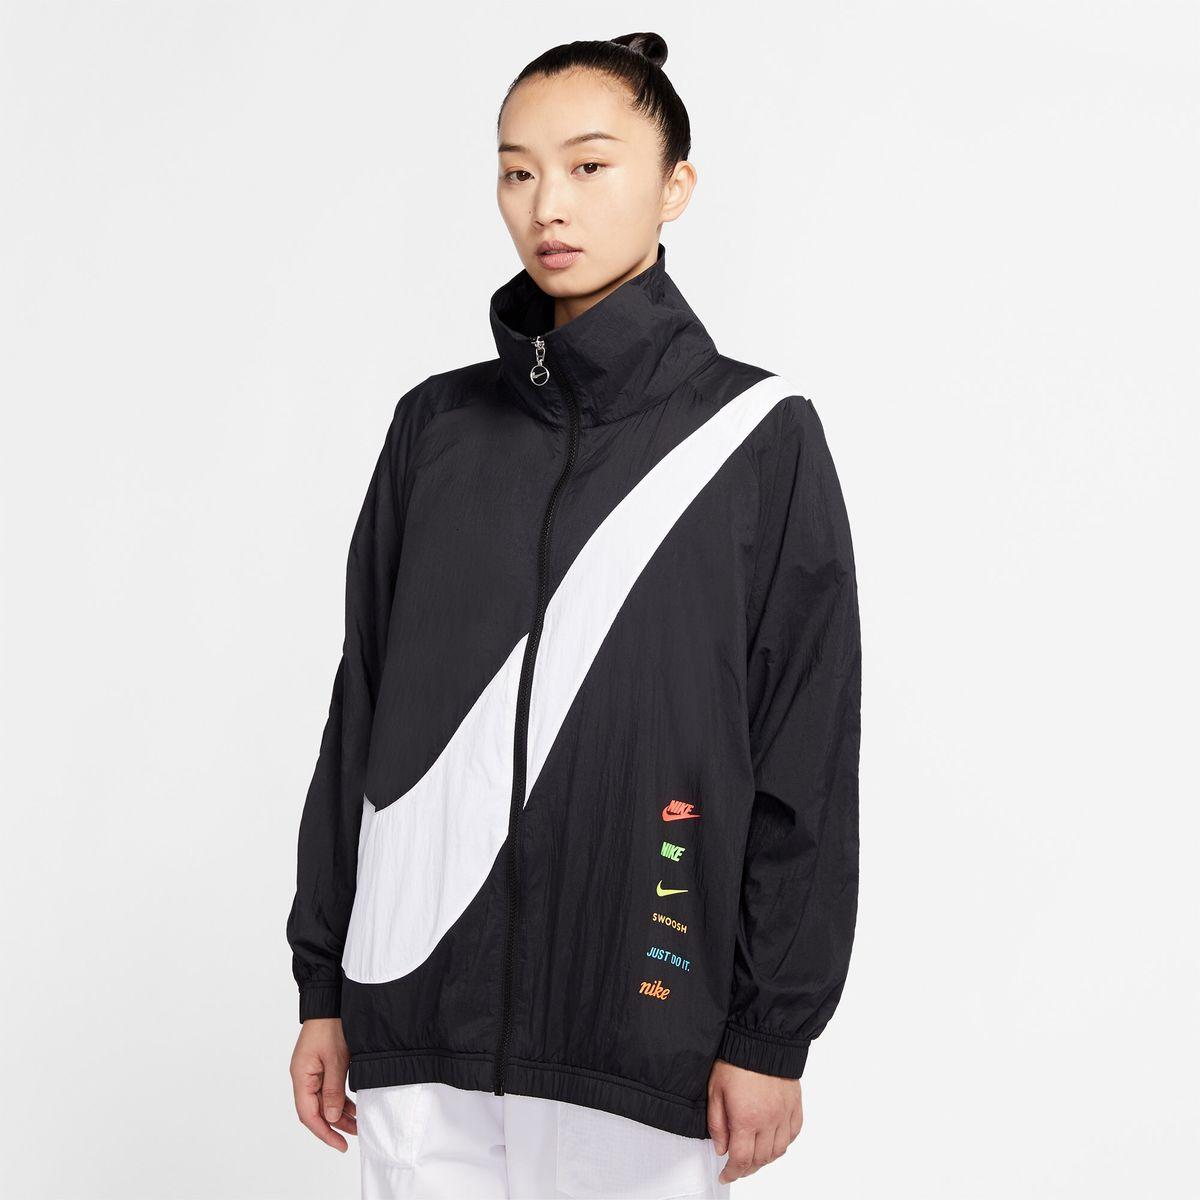 NIKE防風外套 女裝-團購與PTT推薦-2020年8月|飛比價格